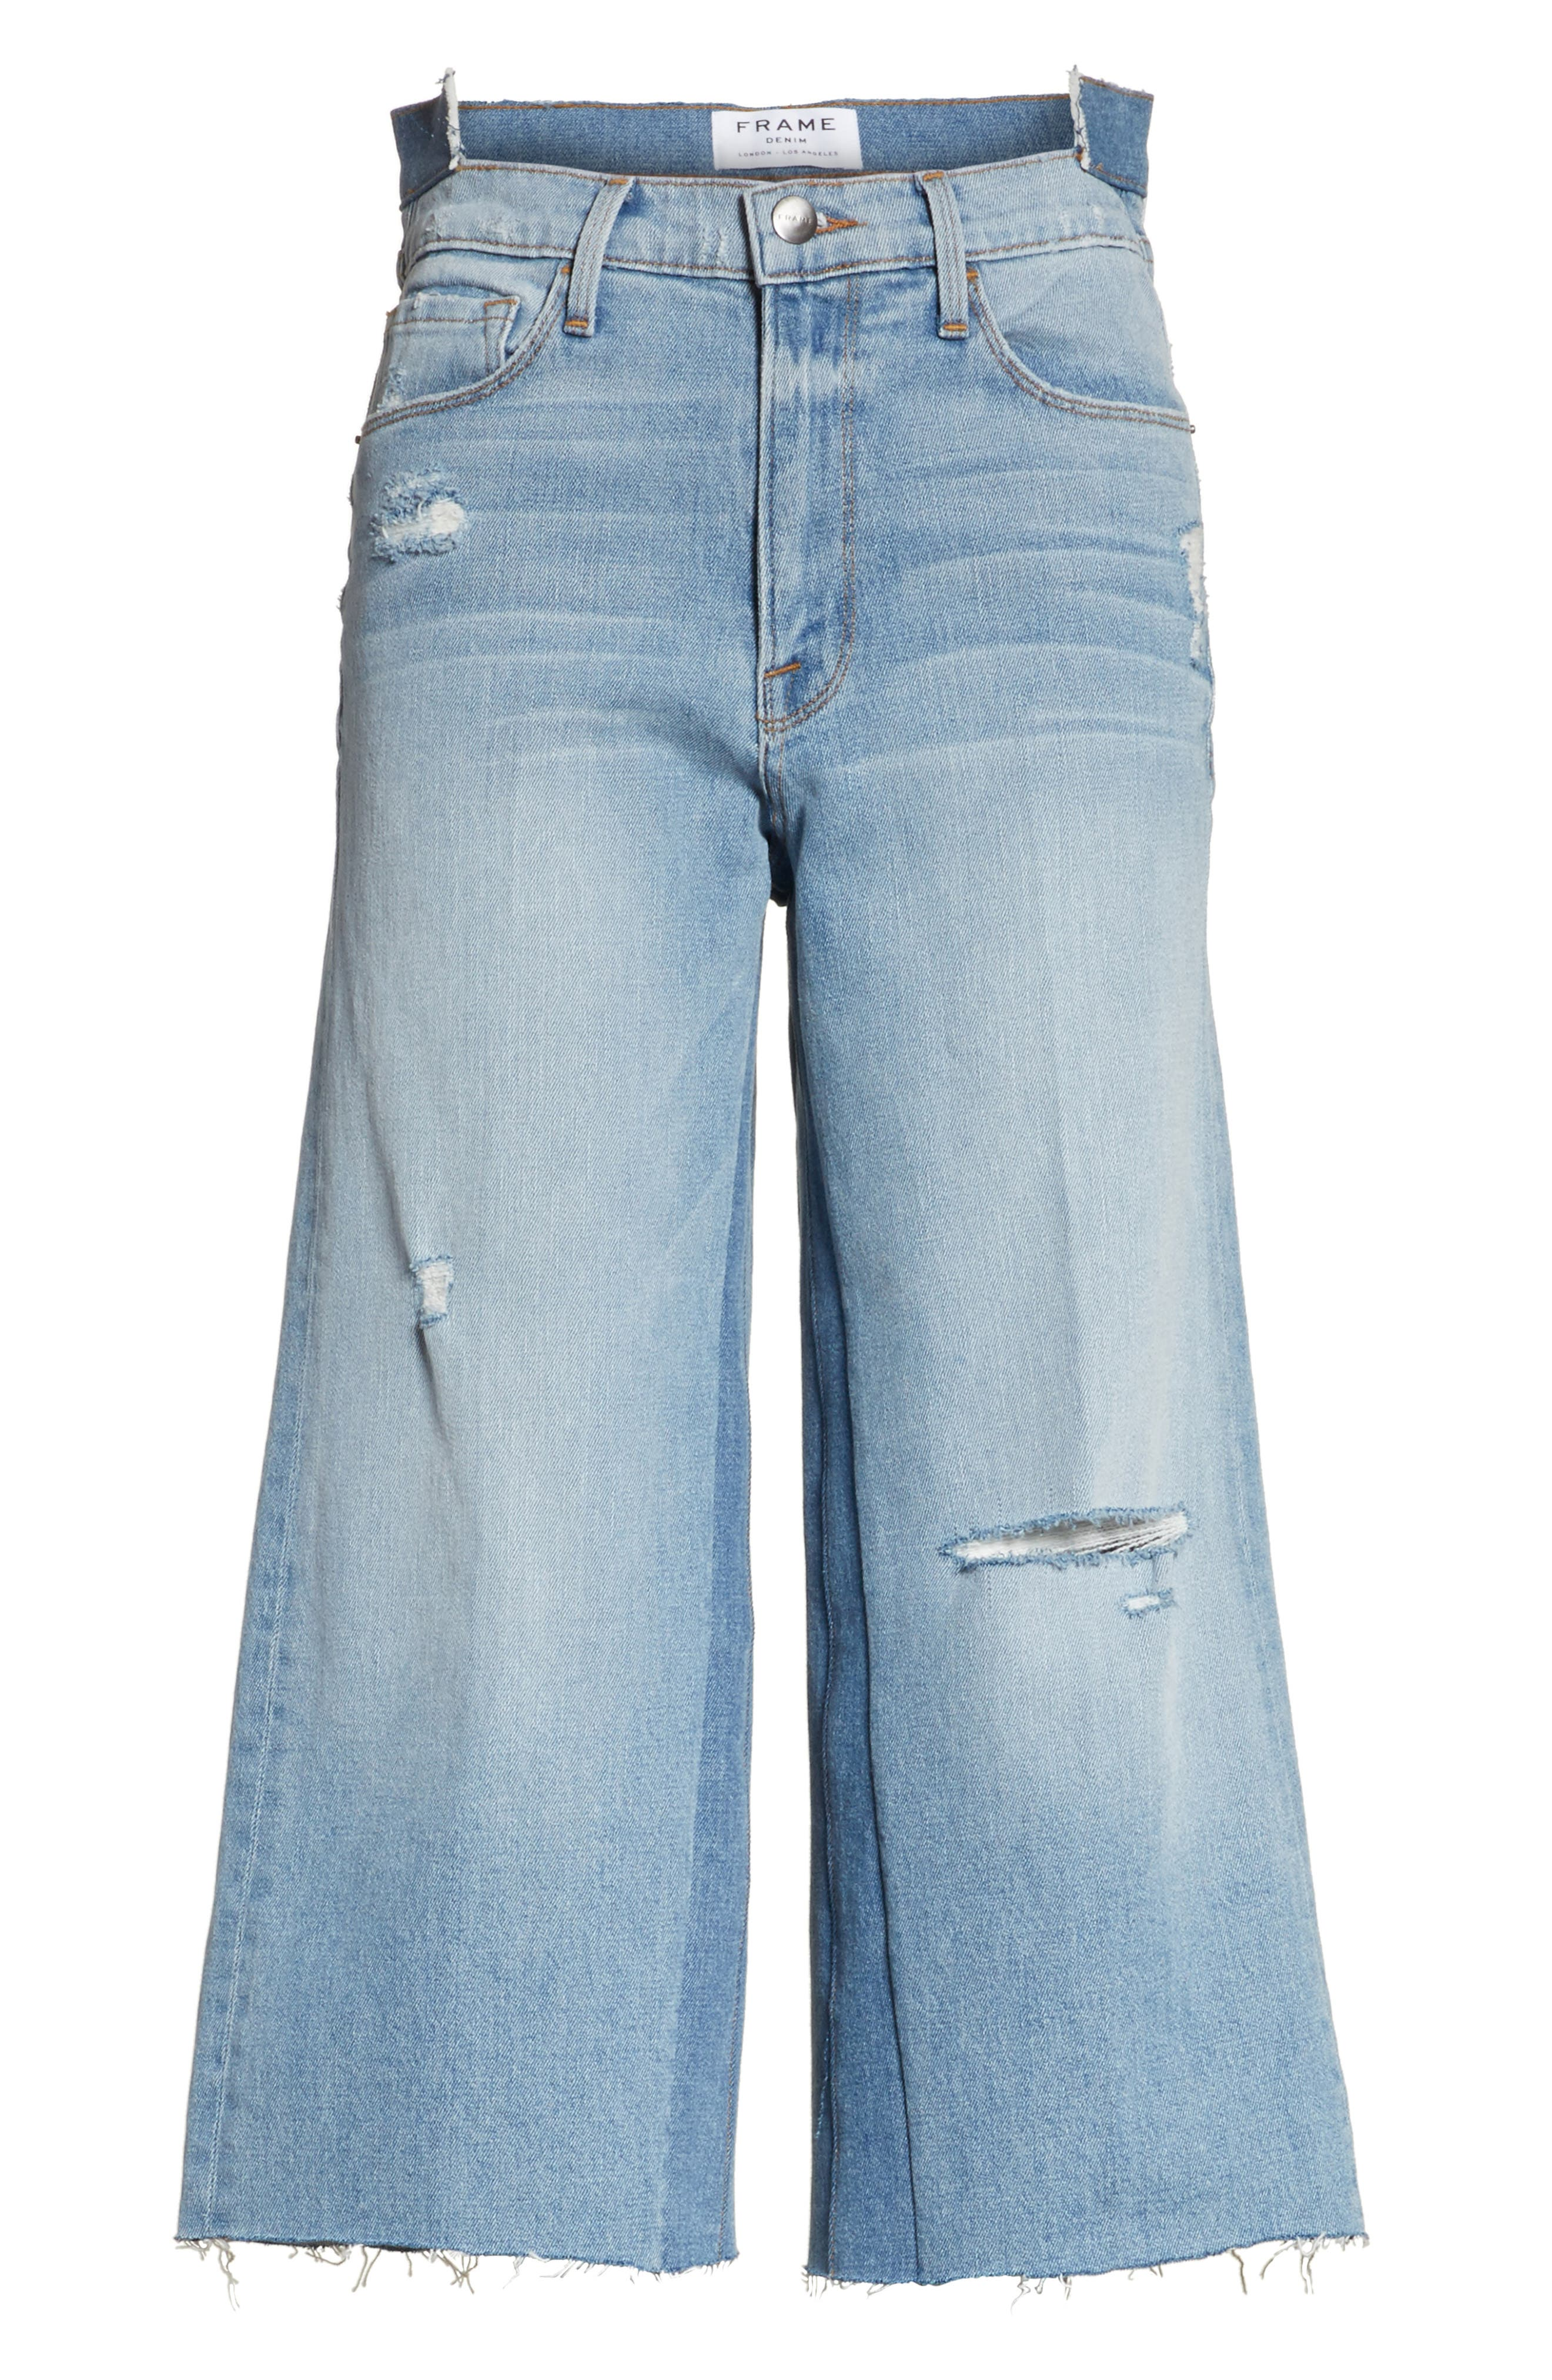 Le Reconstructed High Waist Crop Wide Leg Jeans,                             Alternate thumbnail 7, color,                             Blue